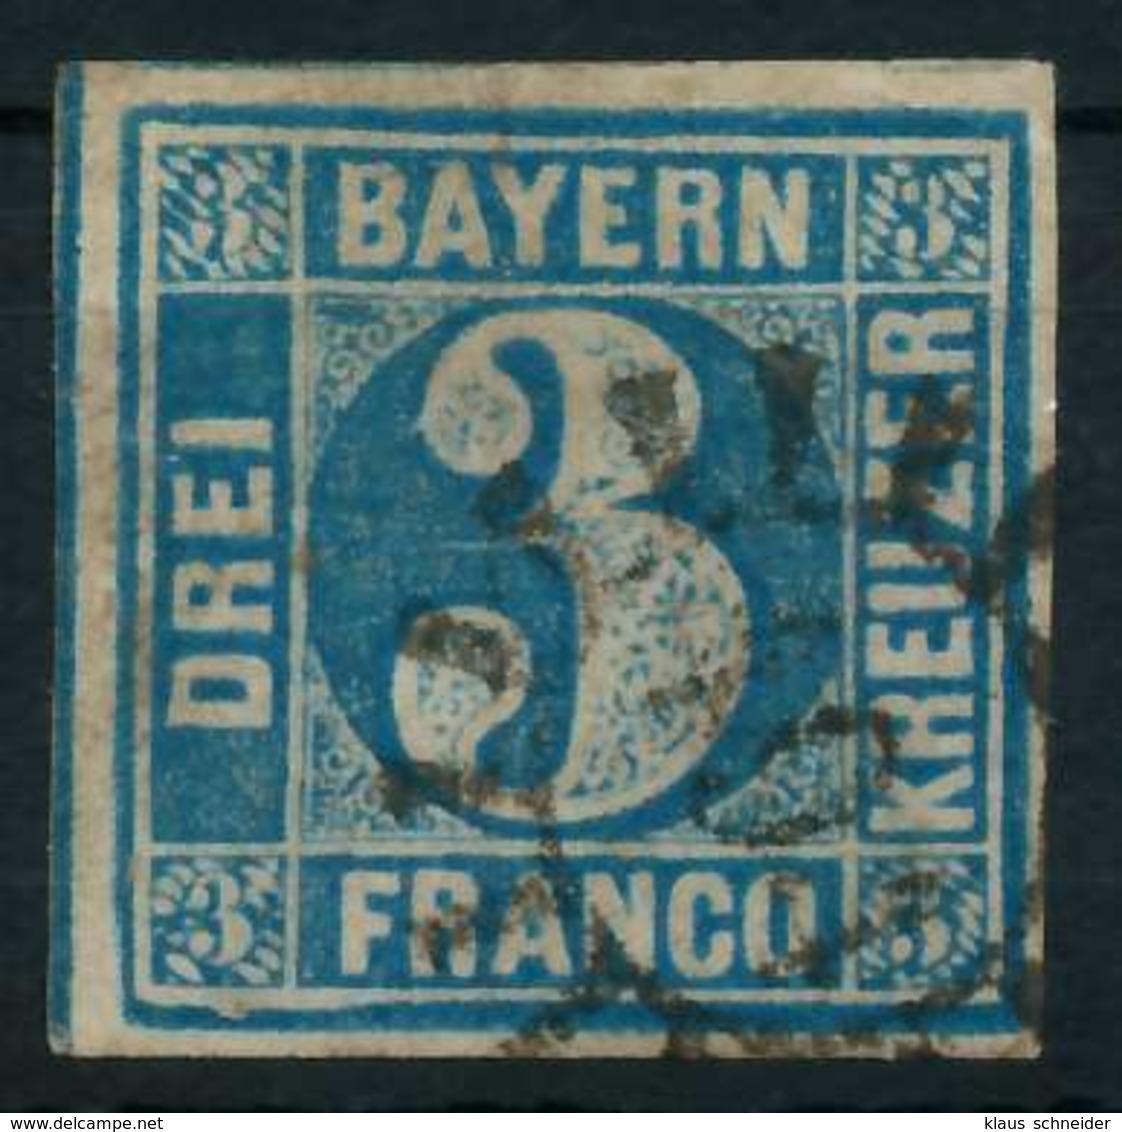 BAYERN QUADRATE Nr 2II GMR 401 Zentrisch Gestempelt X884332 - Bayern